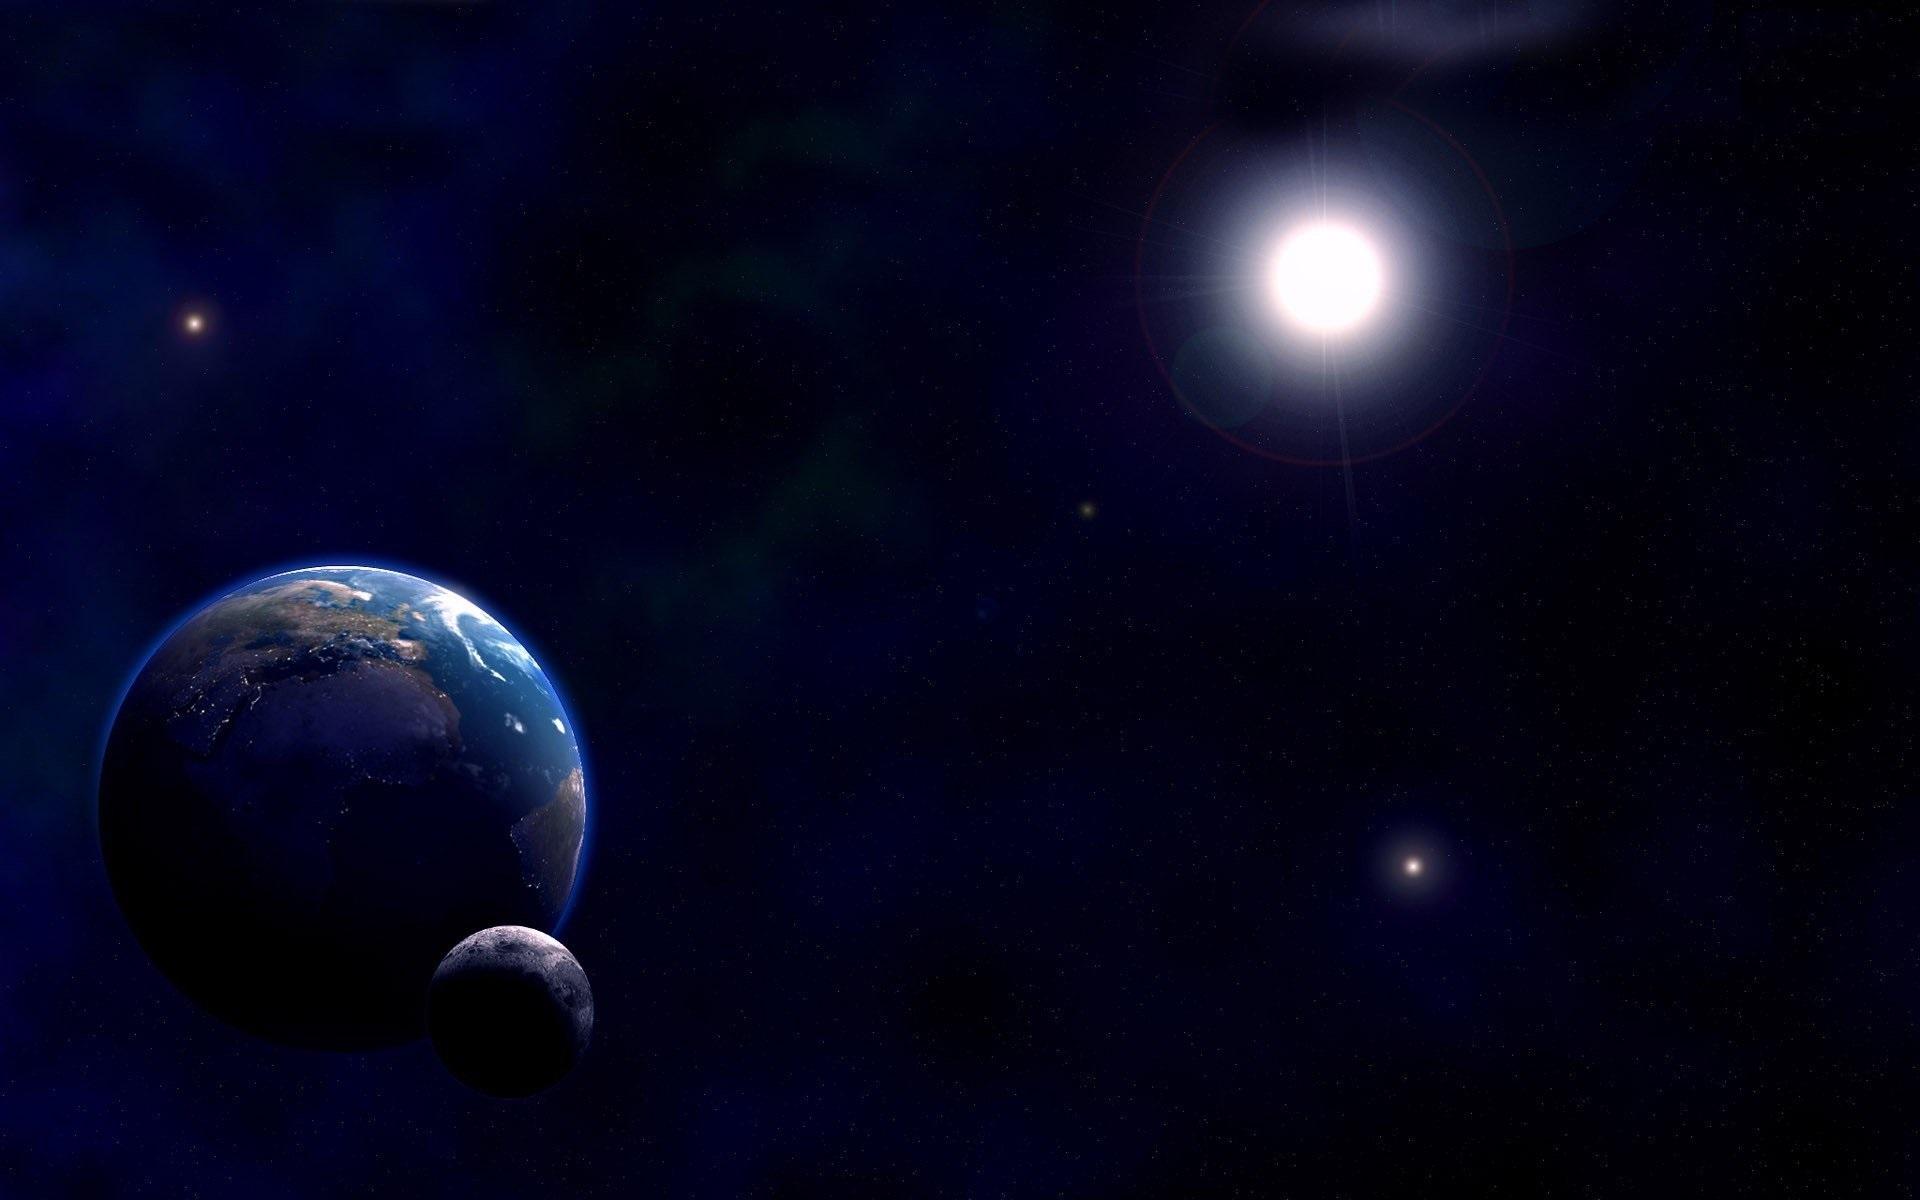 Country Wallpaper Iphone Sun Moon Stars Backgrounds Free Download Pixelstalk Net